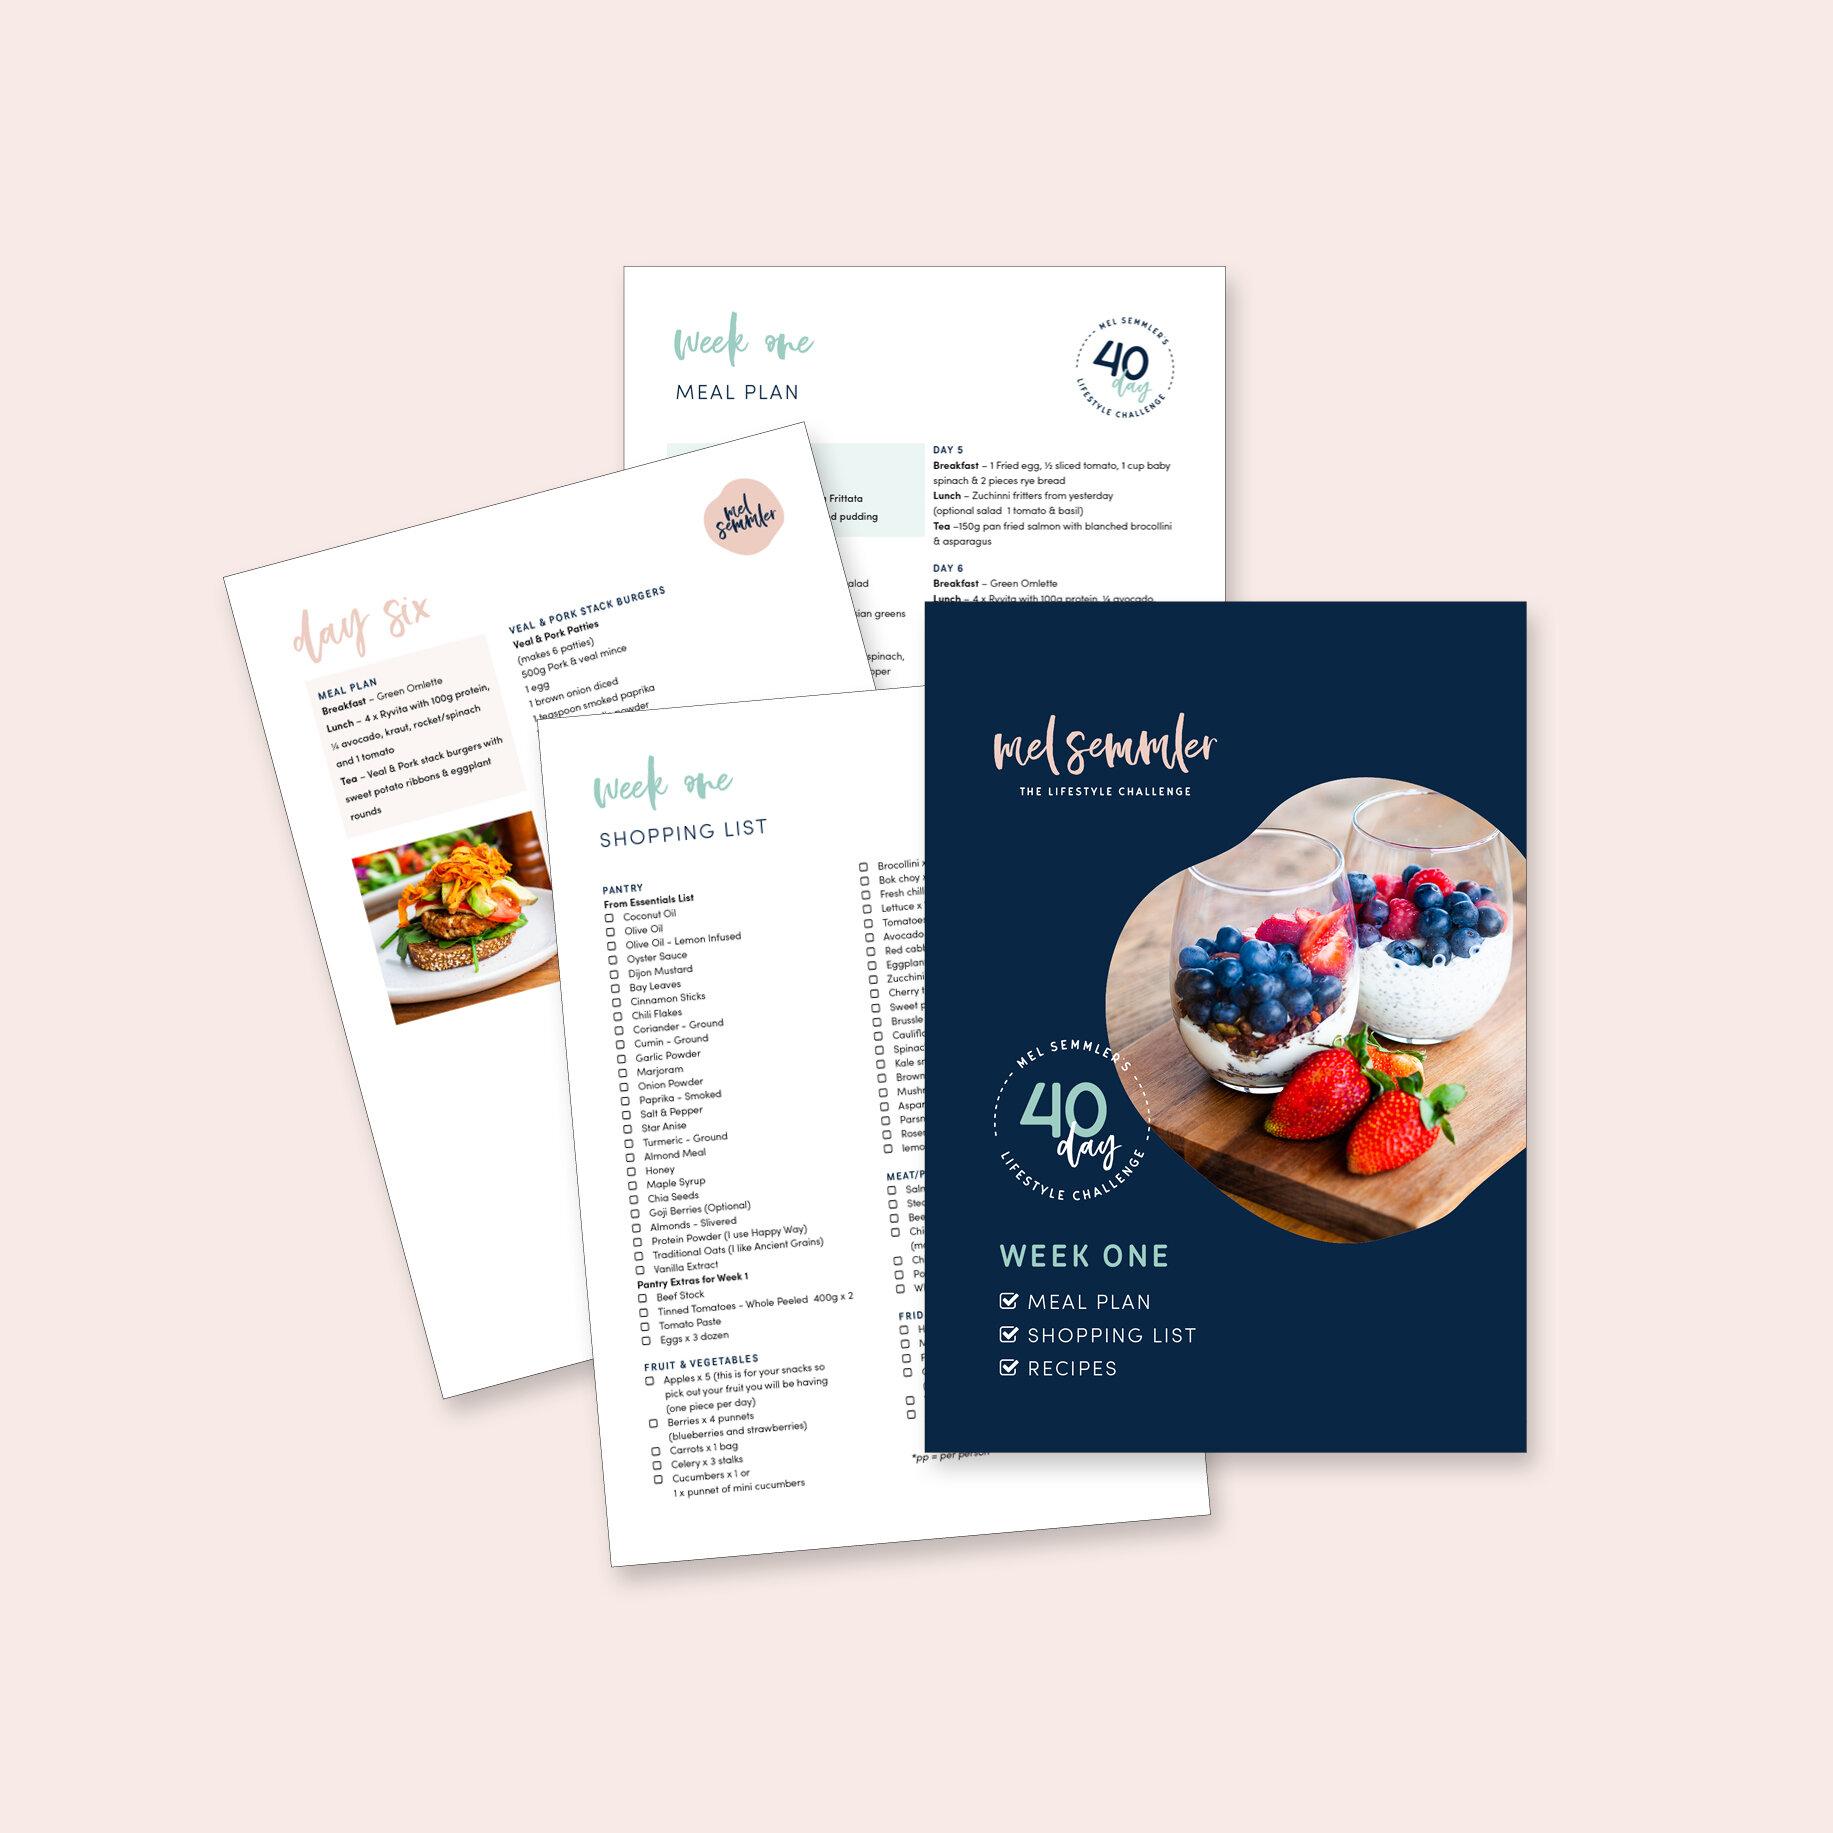 Mel Semmler eBook Design